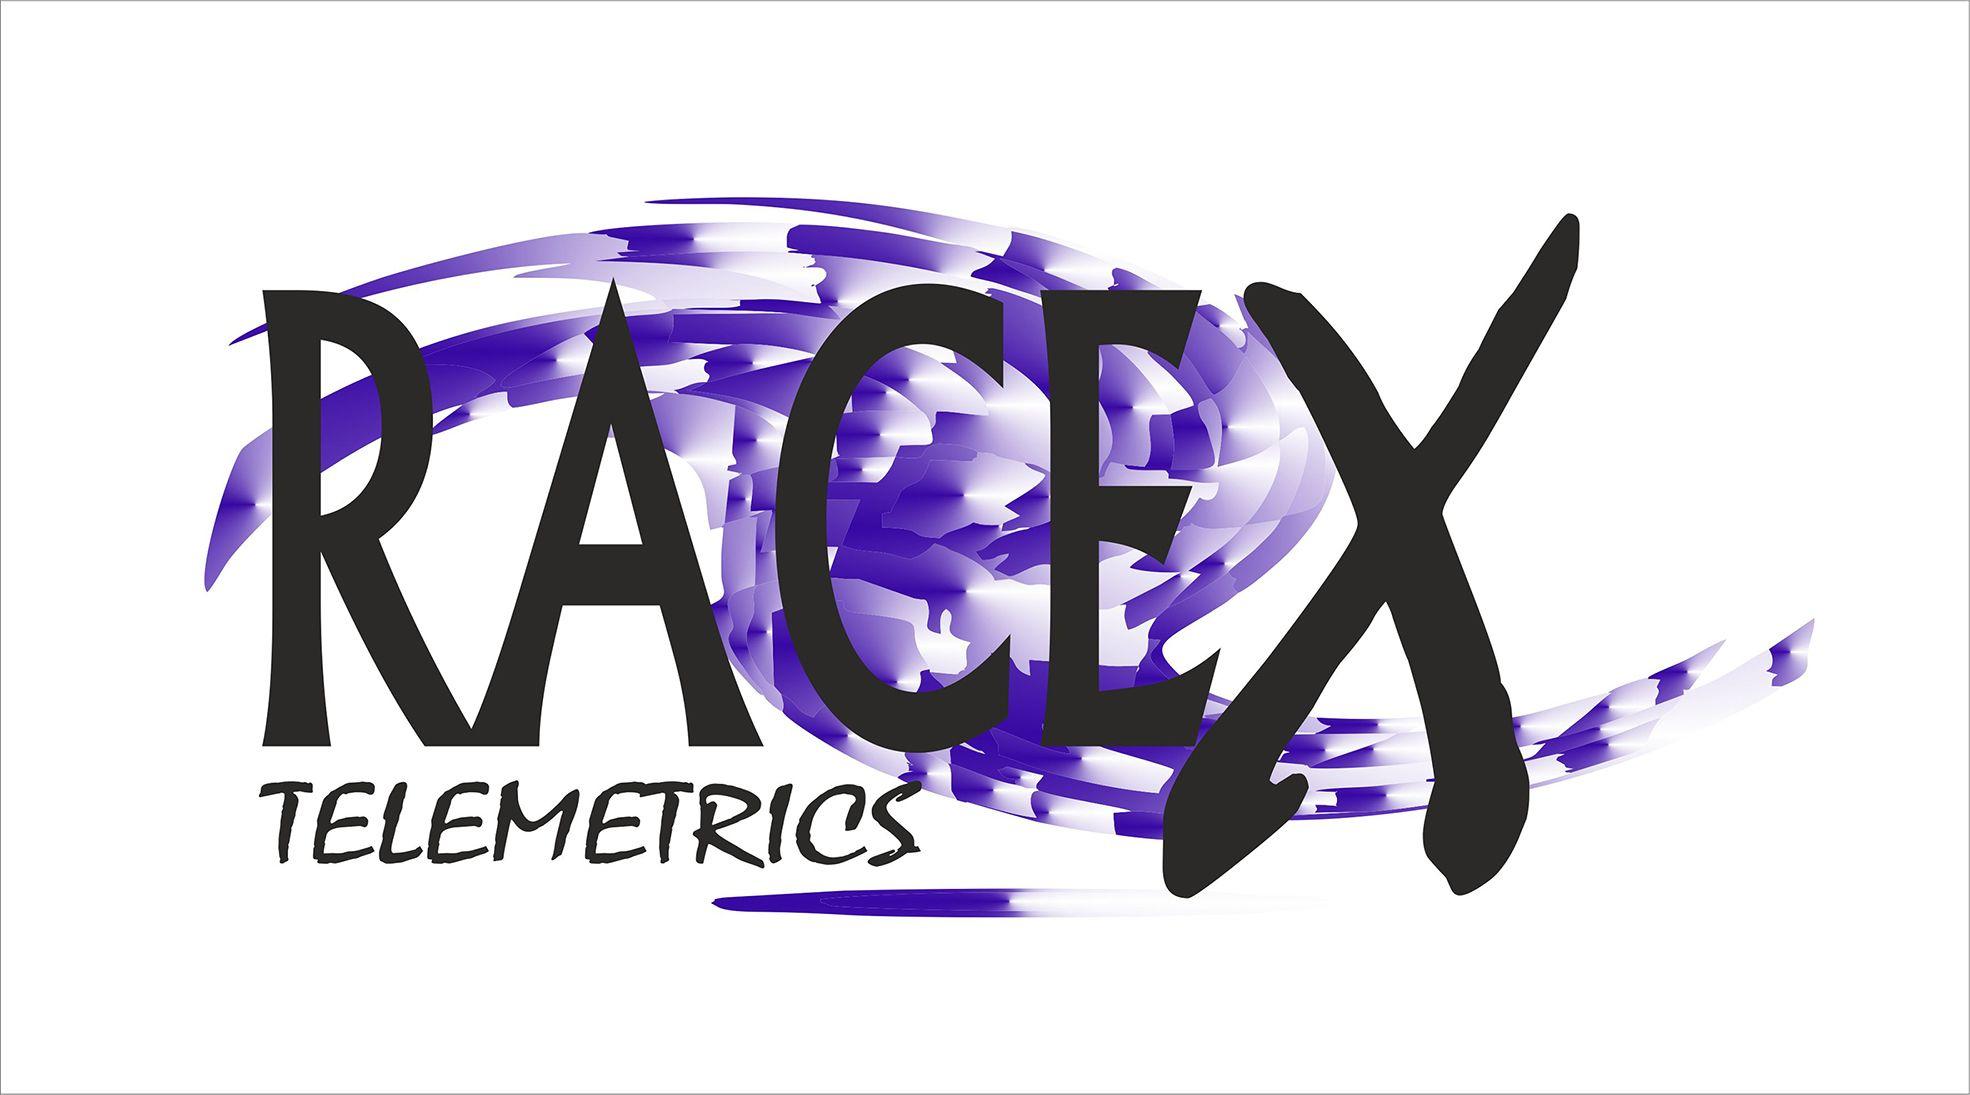 Логотип RaceX Telemetrics  - дизайнер Olga17